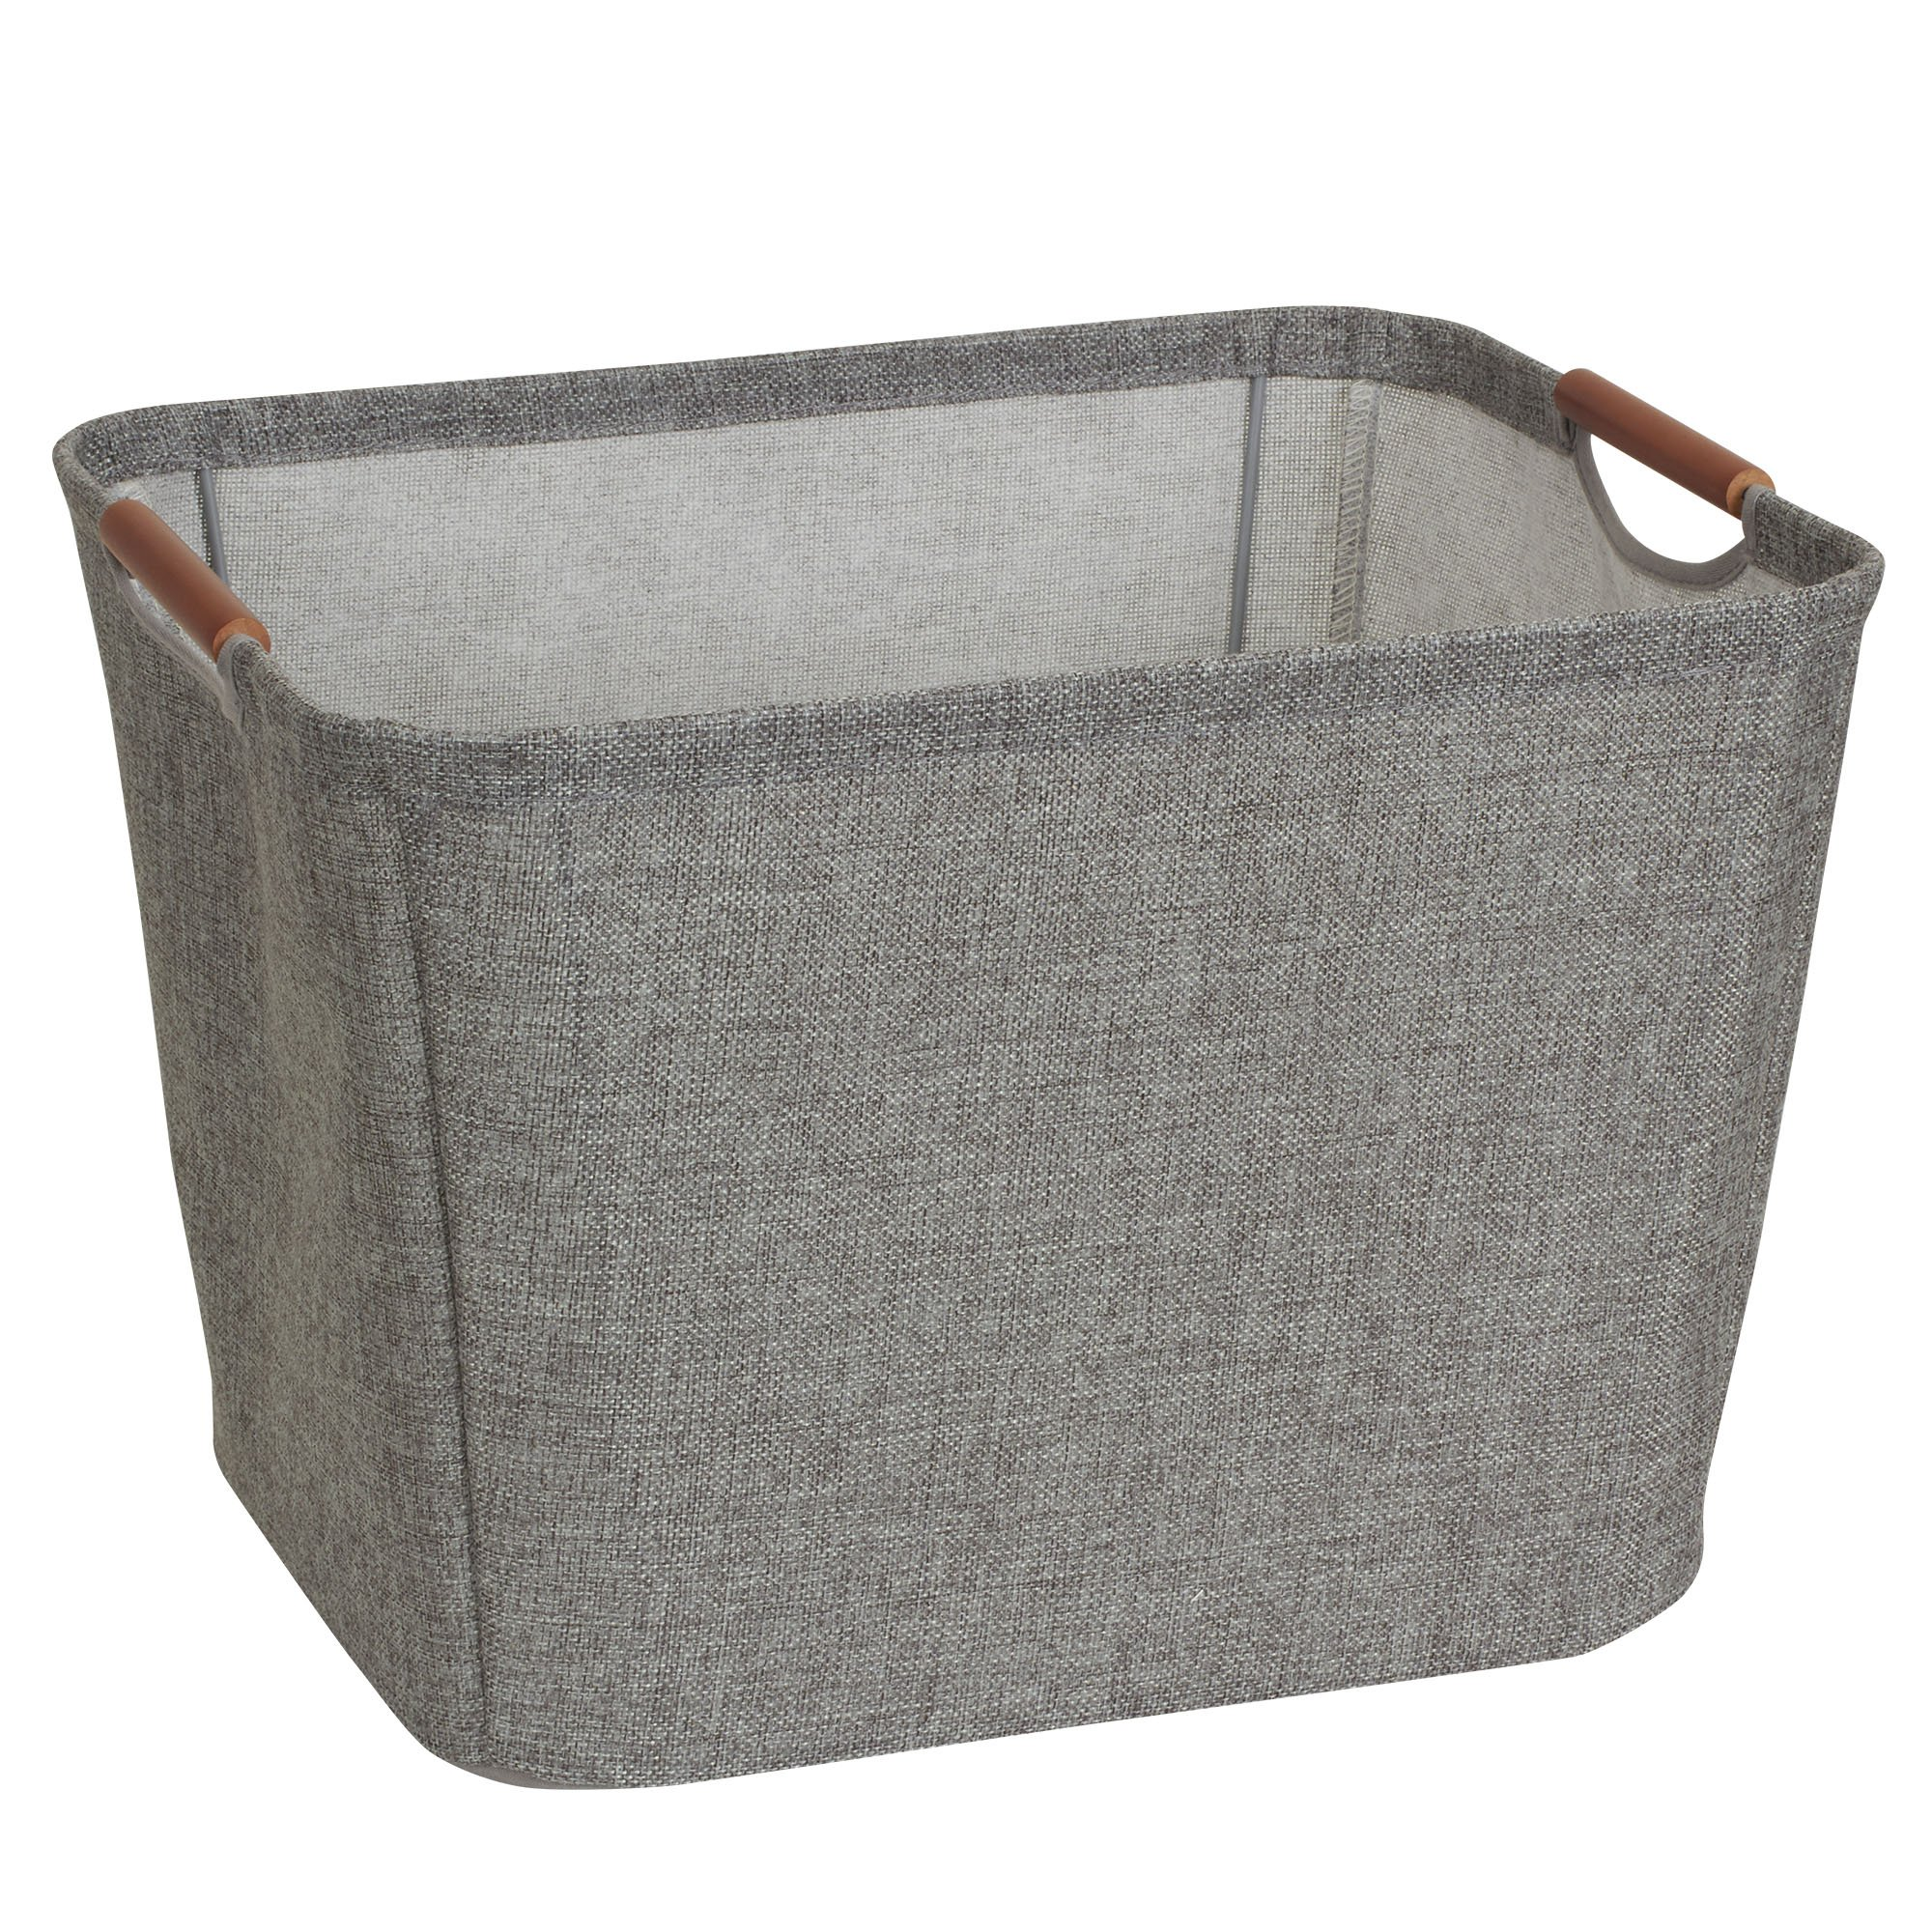 Household Essentials 624 Medium Tapered Soft-Side Storage Bin with Wood Handles, Gray